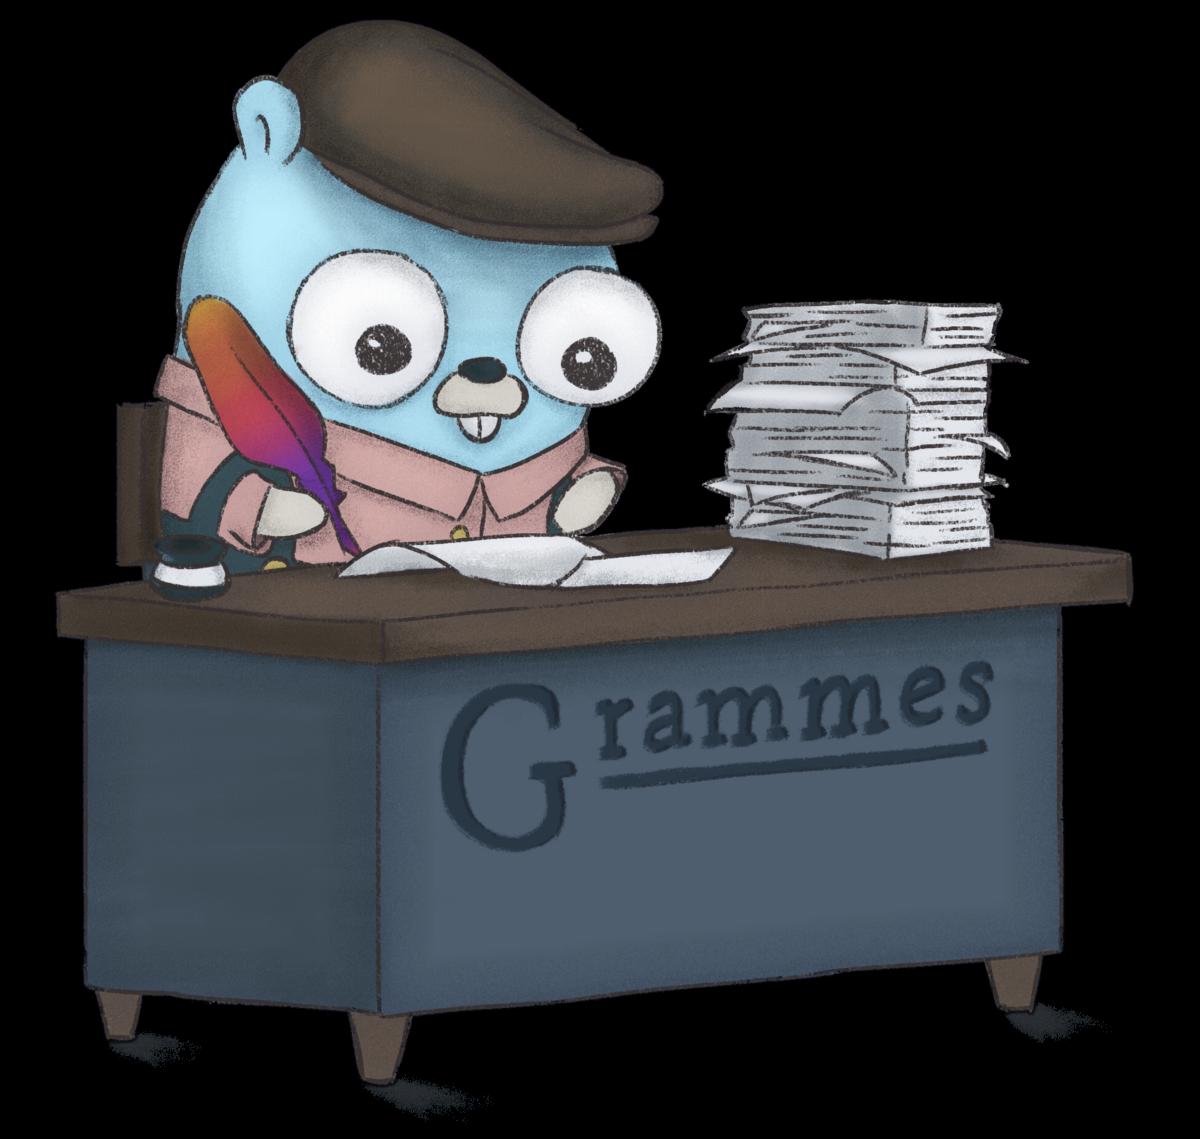 Grammes